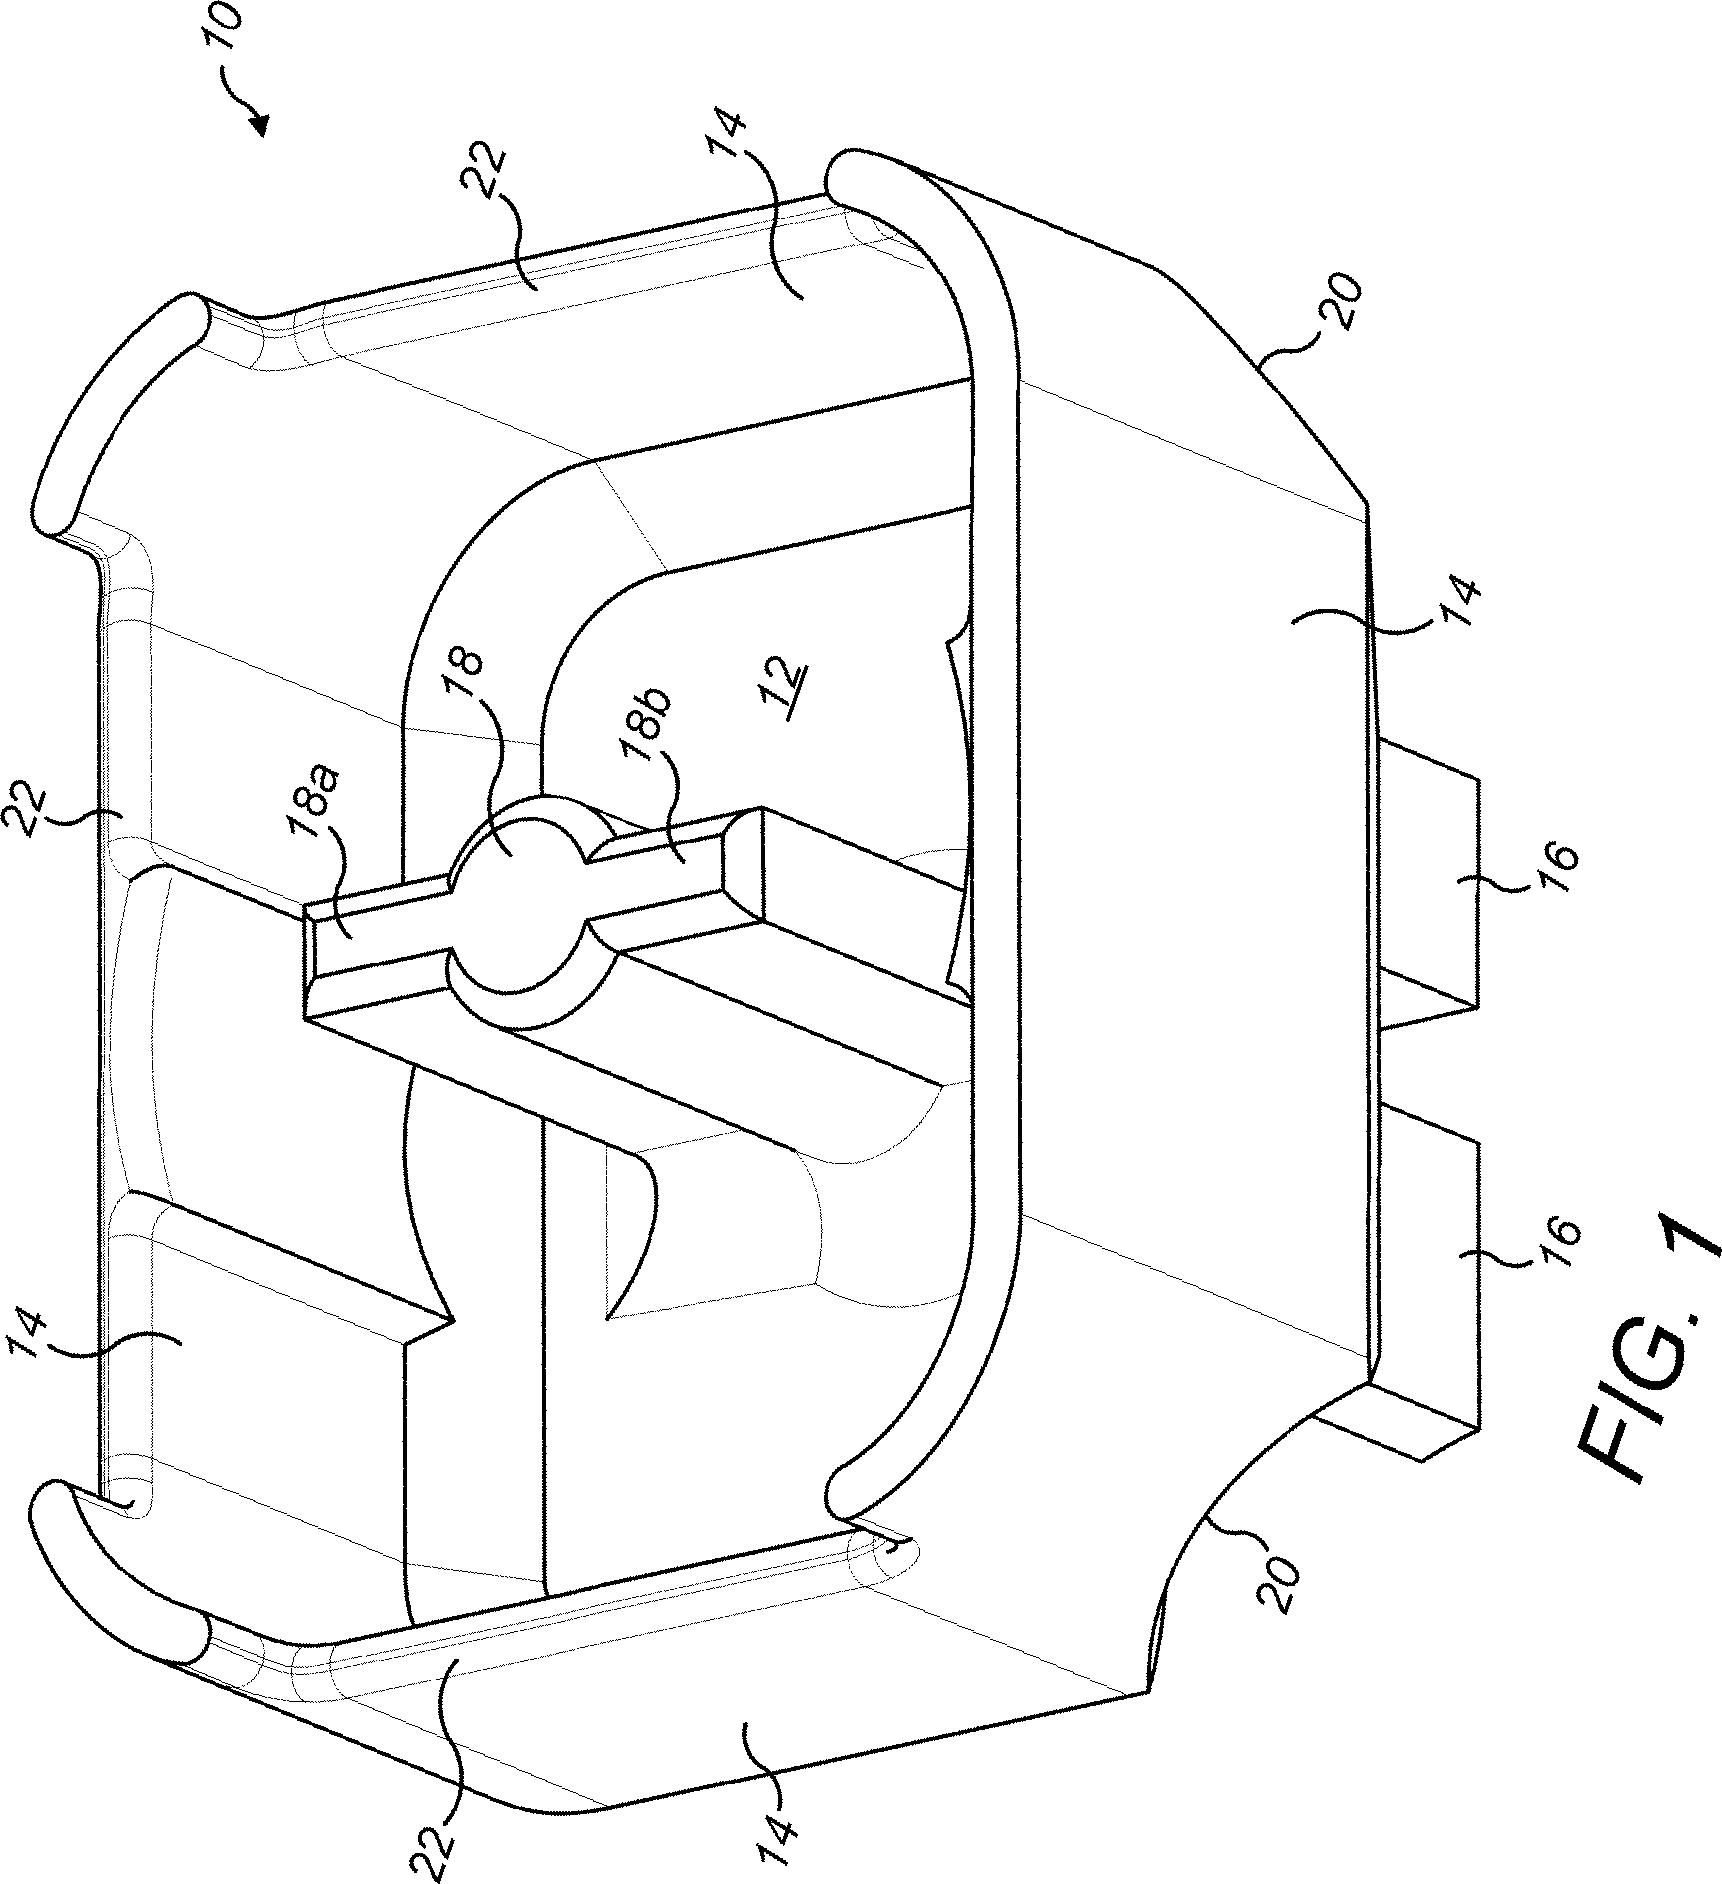 Figure GB2555832A_D0002